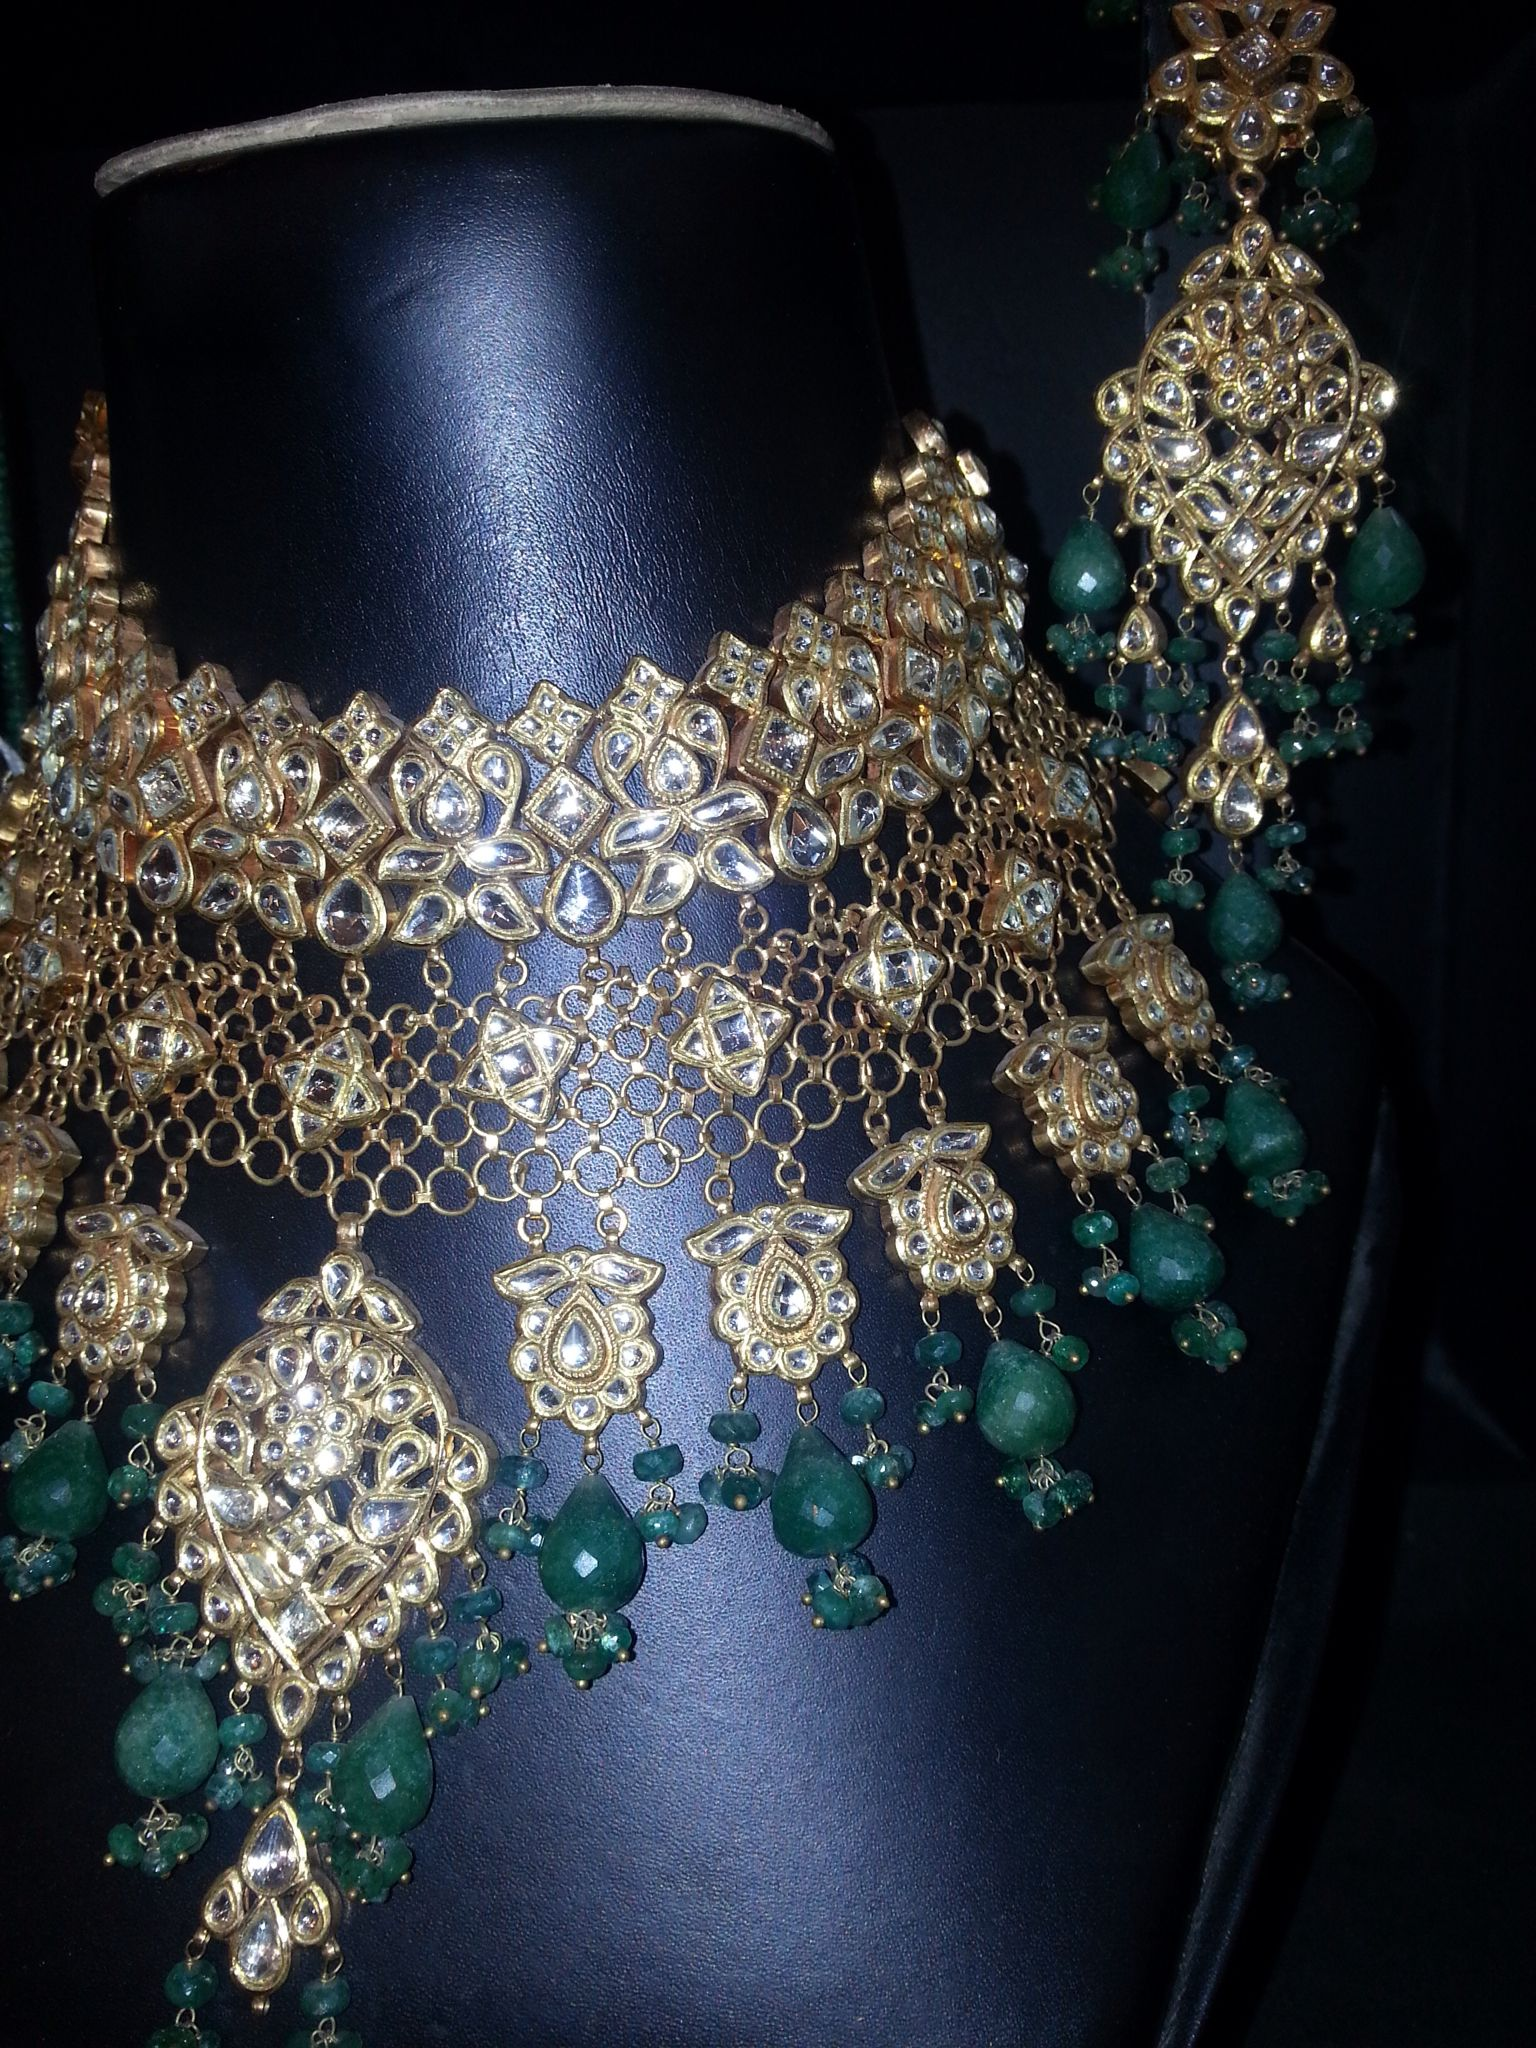 Ravishing bridal set in kt gold avialable for order jewellery